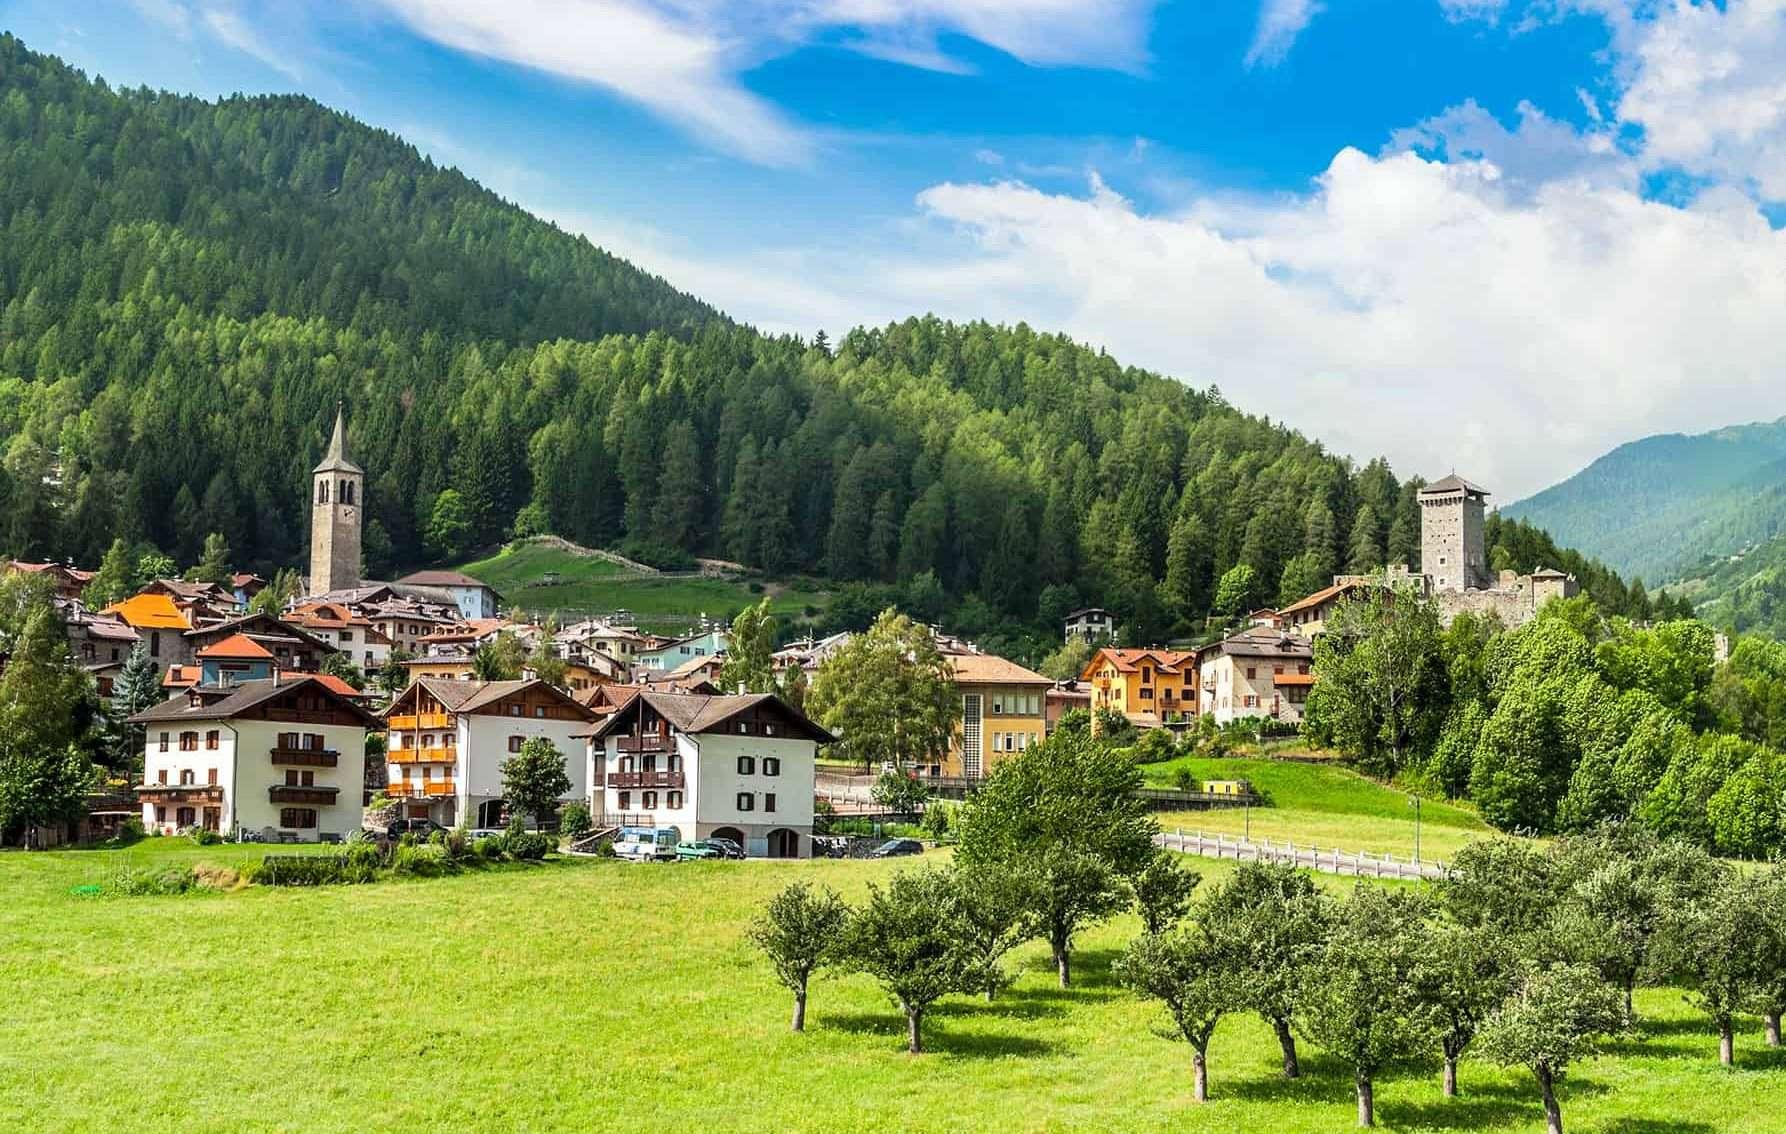 Ossana, il borgo dei 1000 presepi - © Vaghis - viaggi & turismo Italia Tutti i diritti riservati